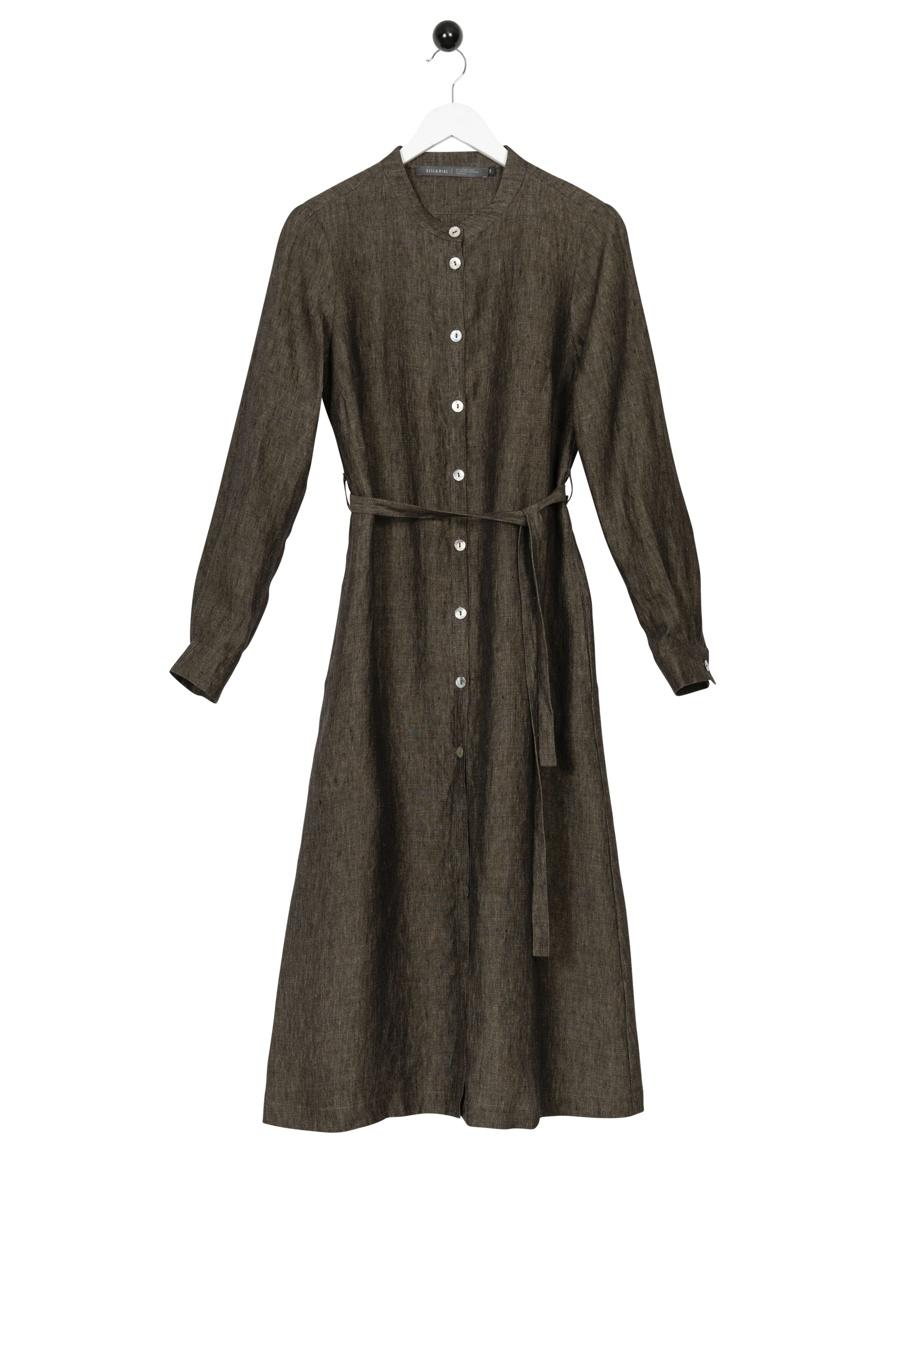 Rochefort Dress